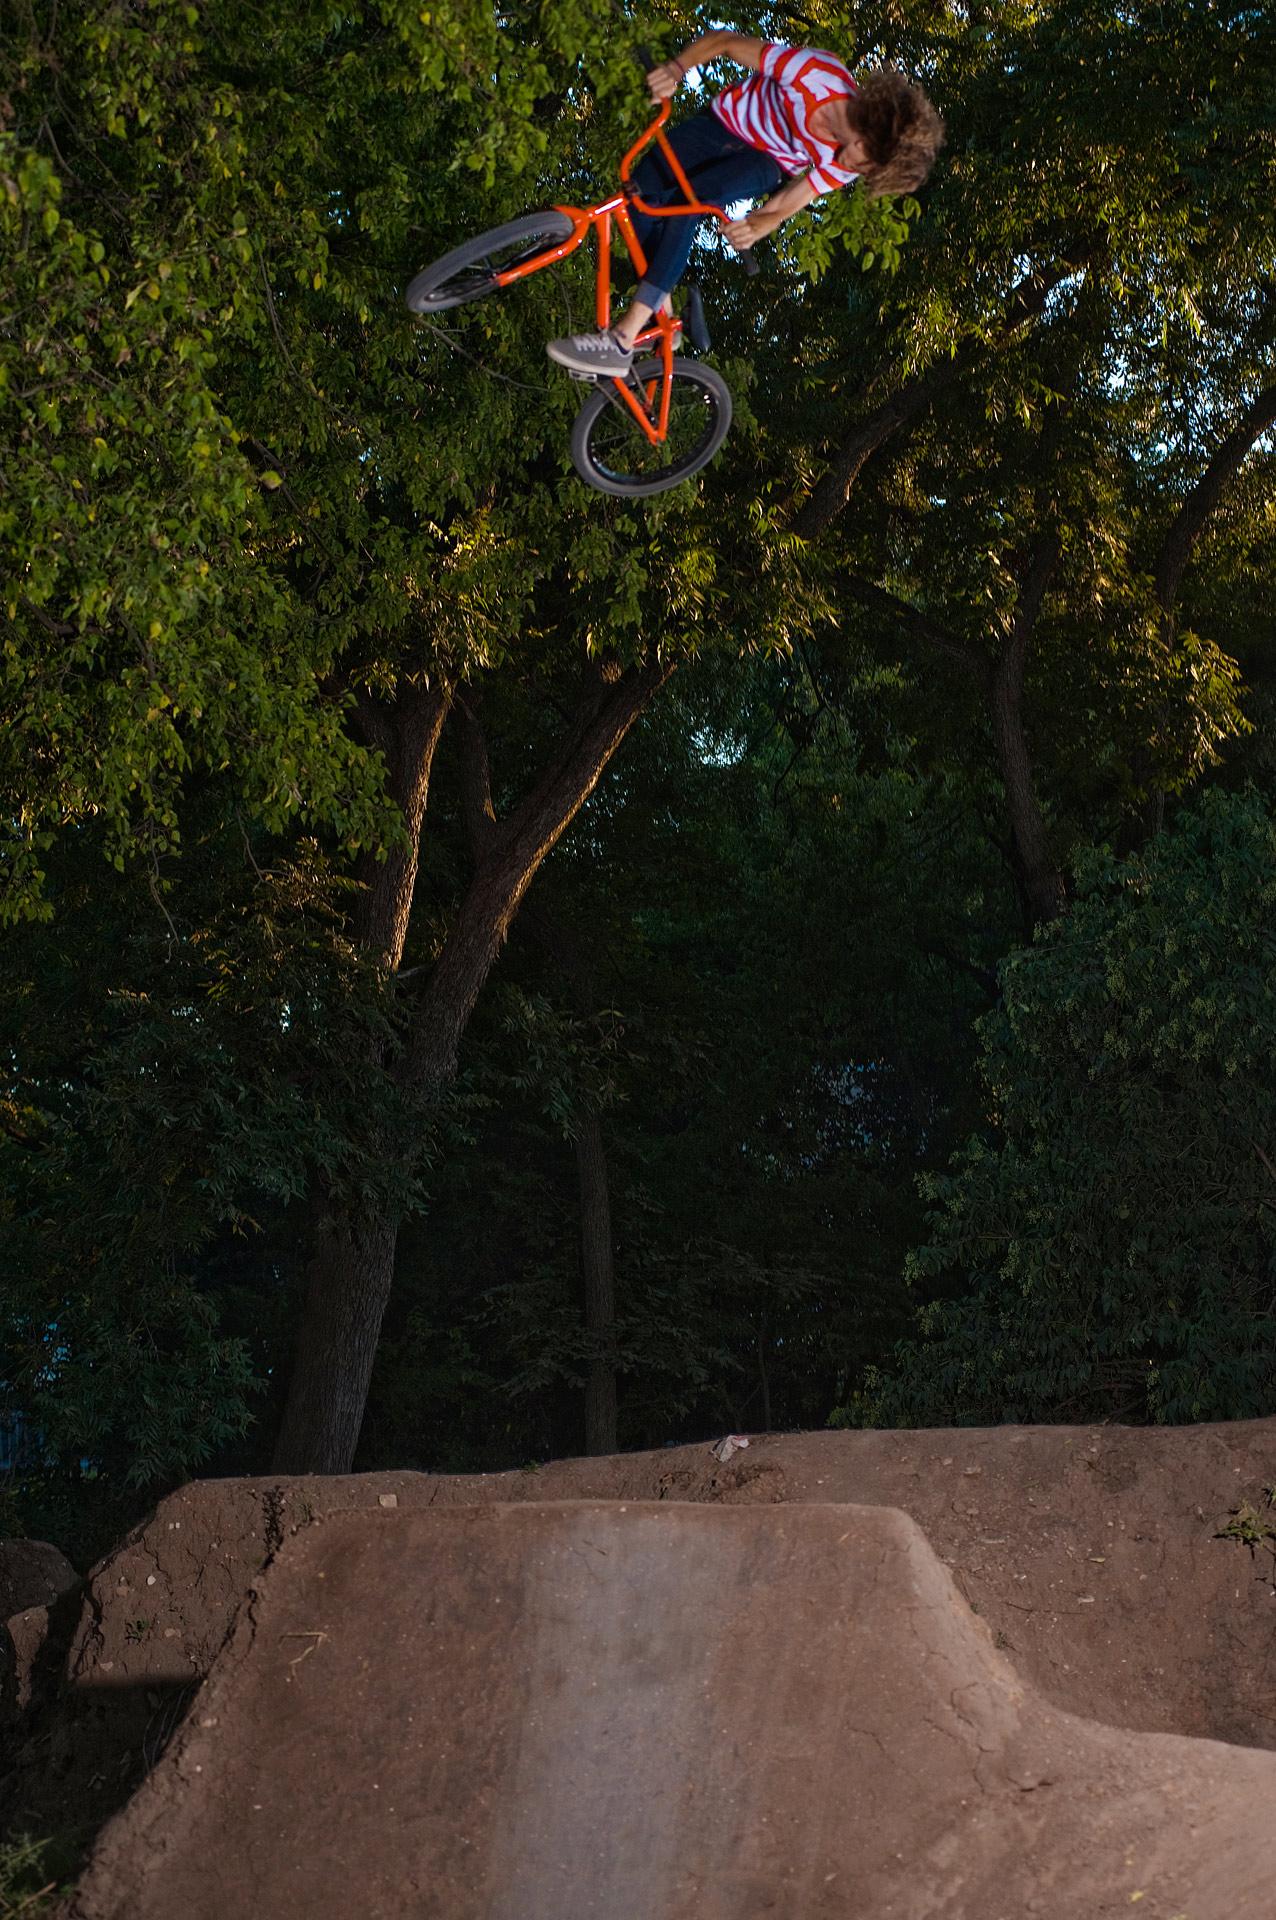 Tom Dugan, BMX pro